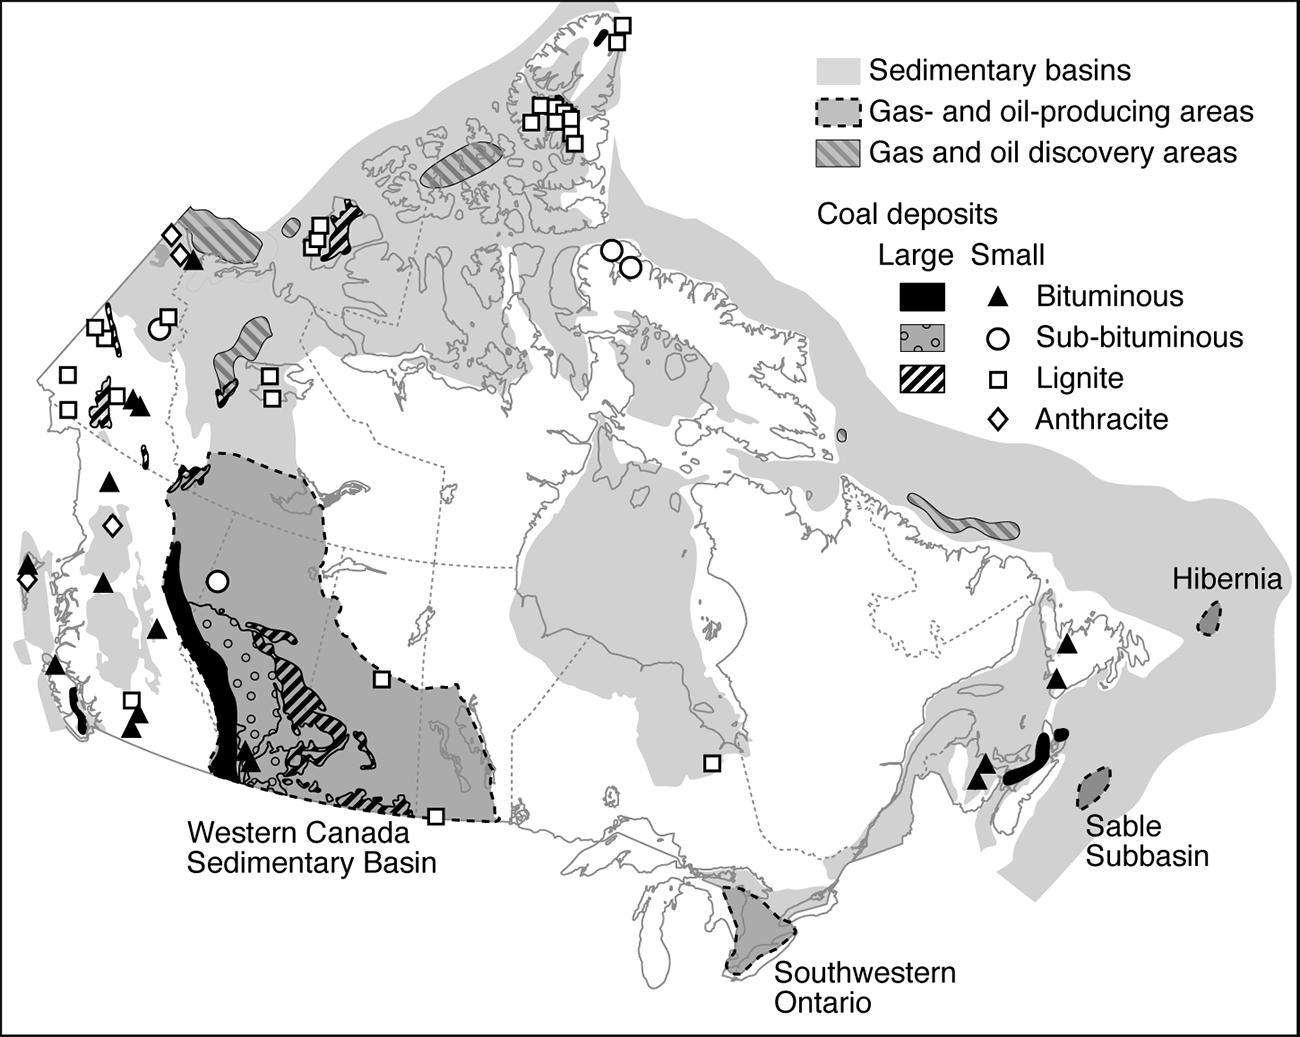 Canada's sedimentary basins